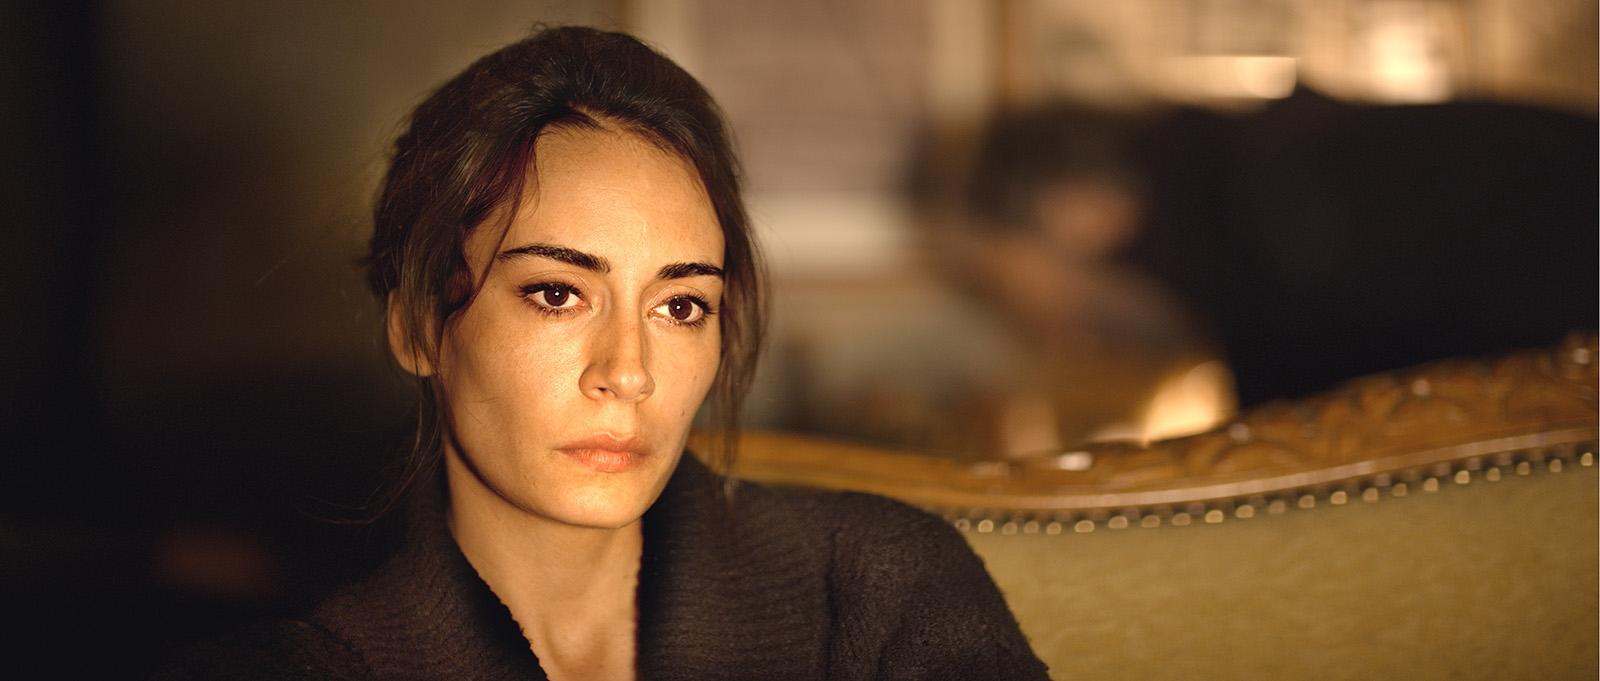 Hibernation: Melisa Sözen in una scena del film